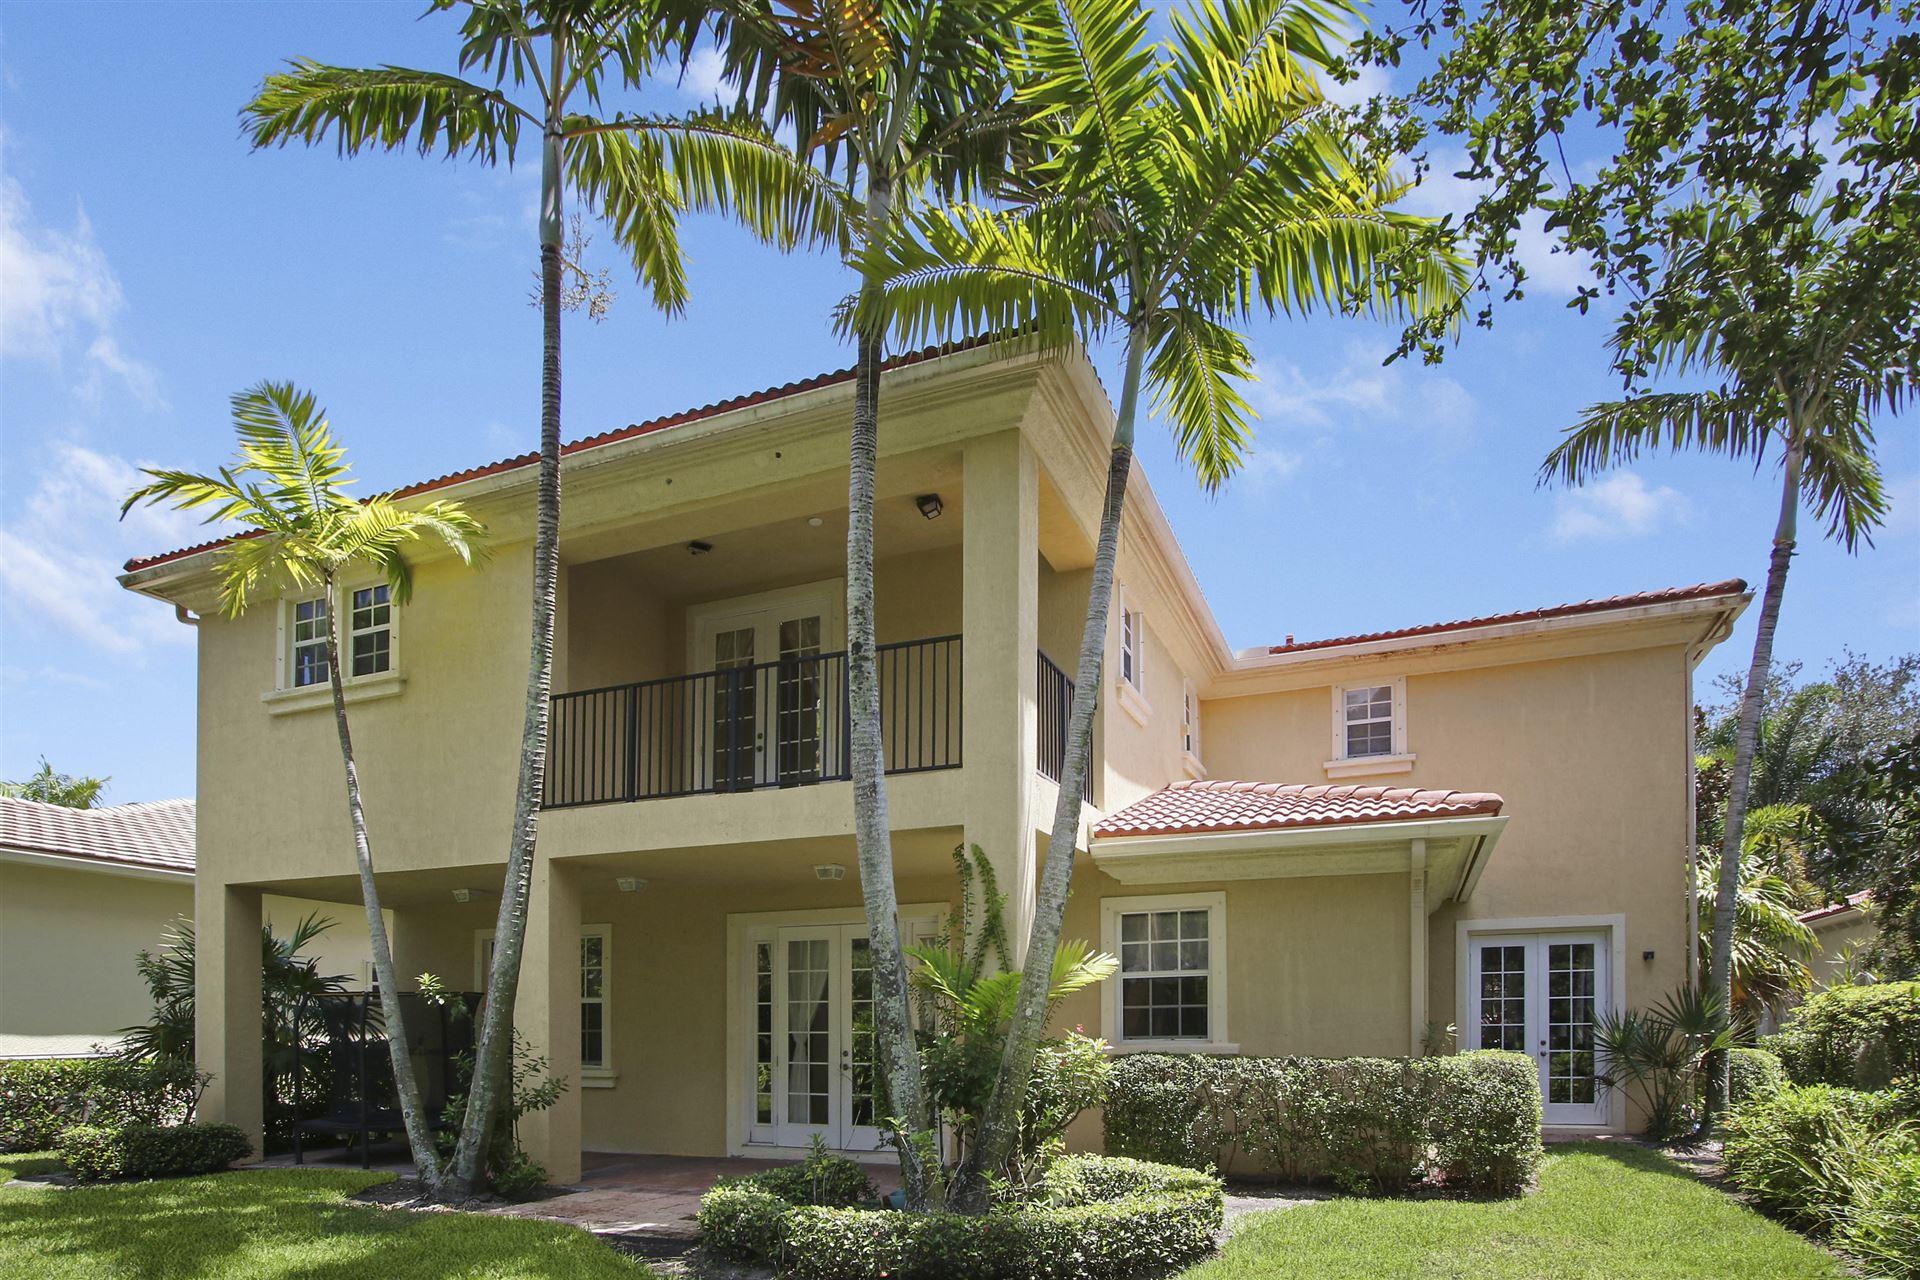 Photo of 1107 Vintner Boulevard, Palm Beach Gardens, FL 33410 (MLS # RX-10740551)